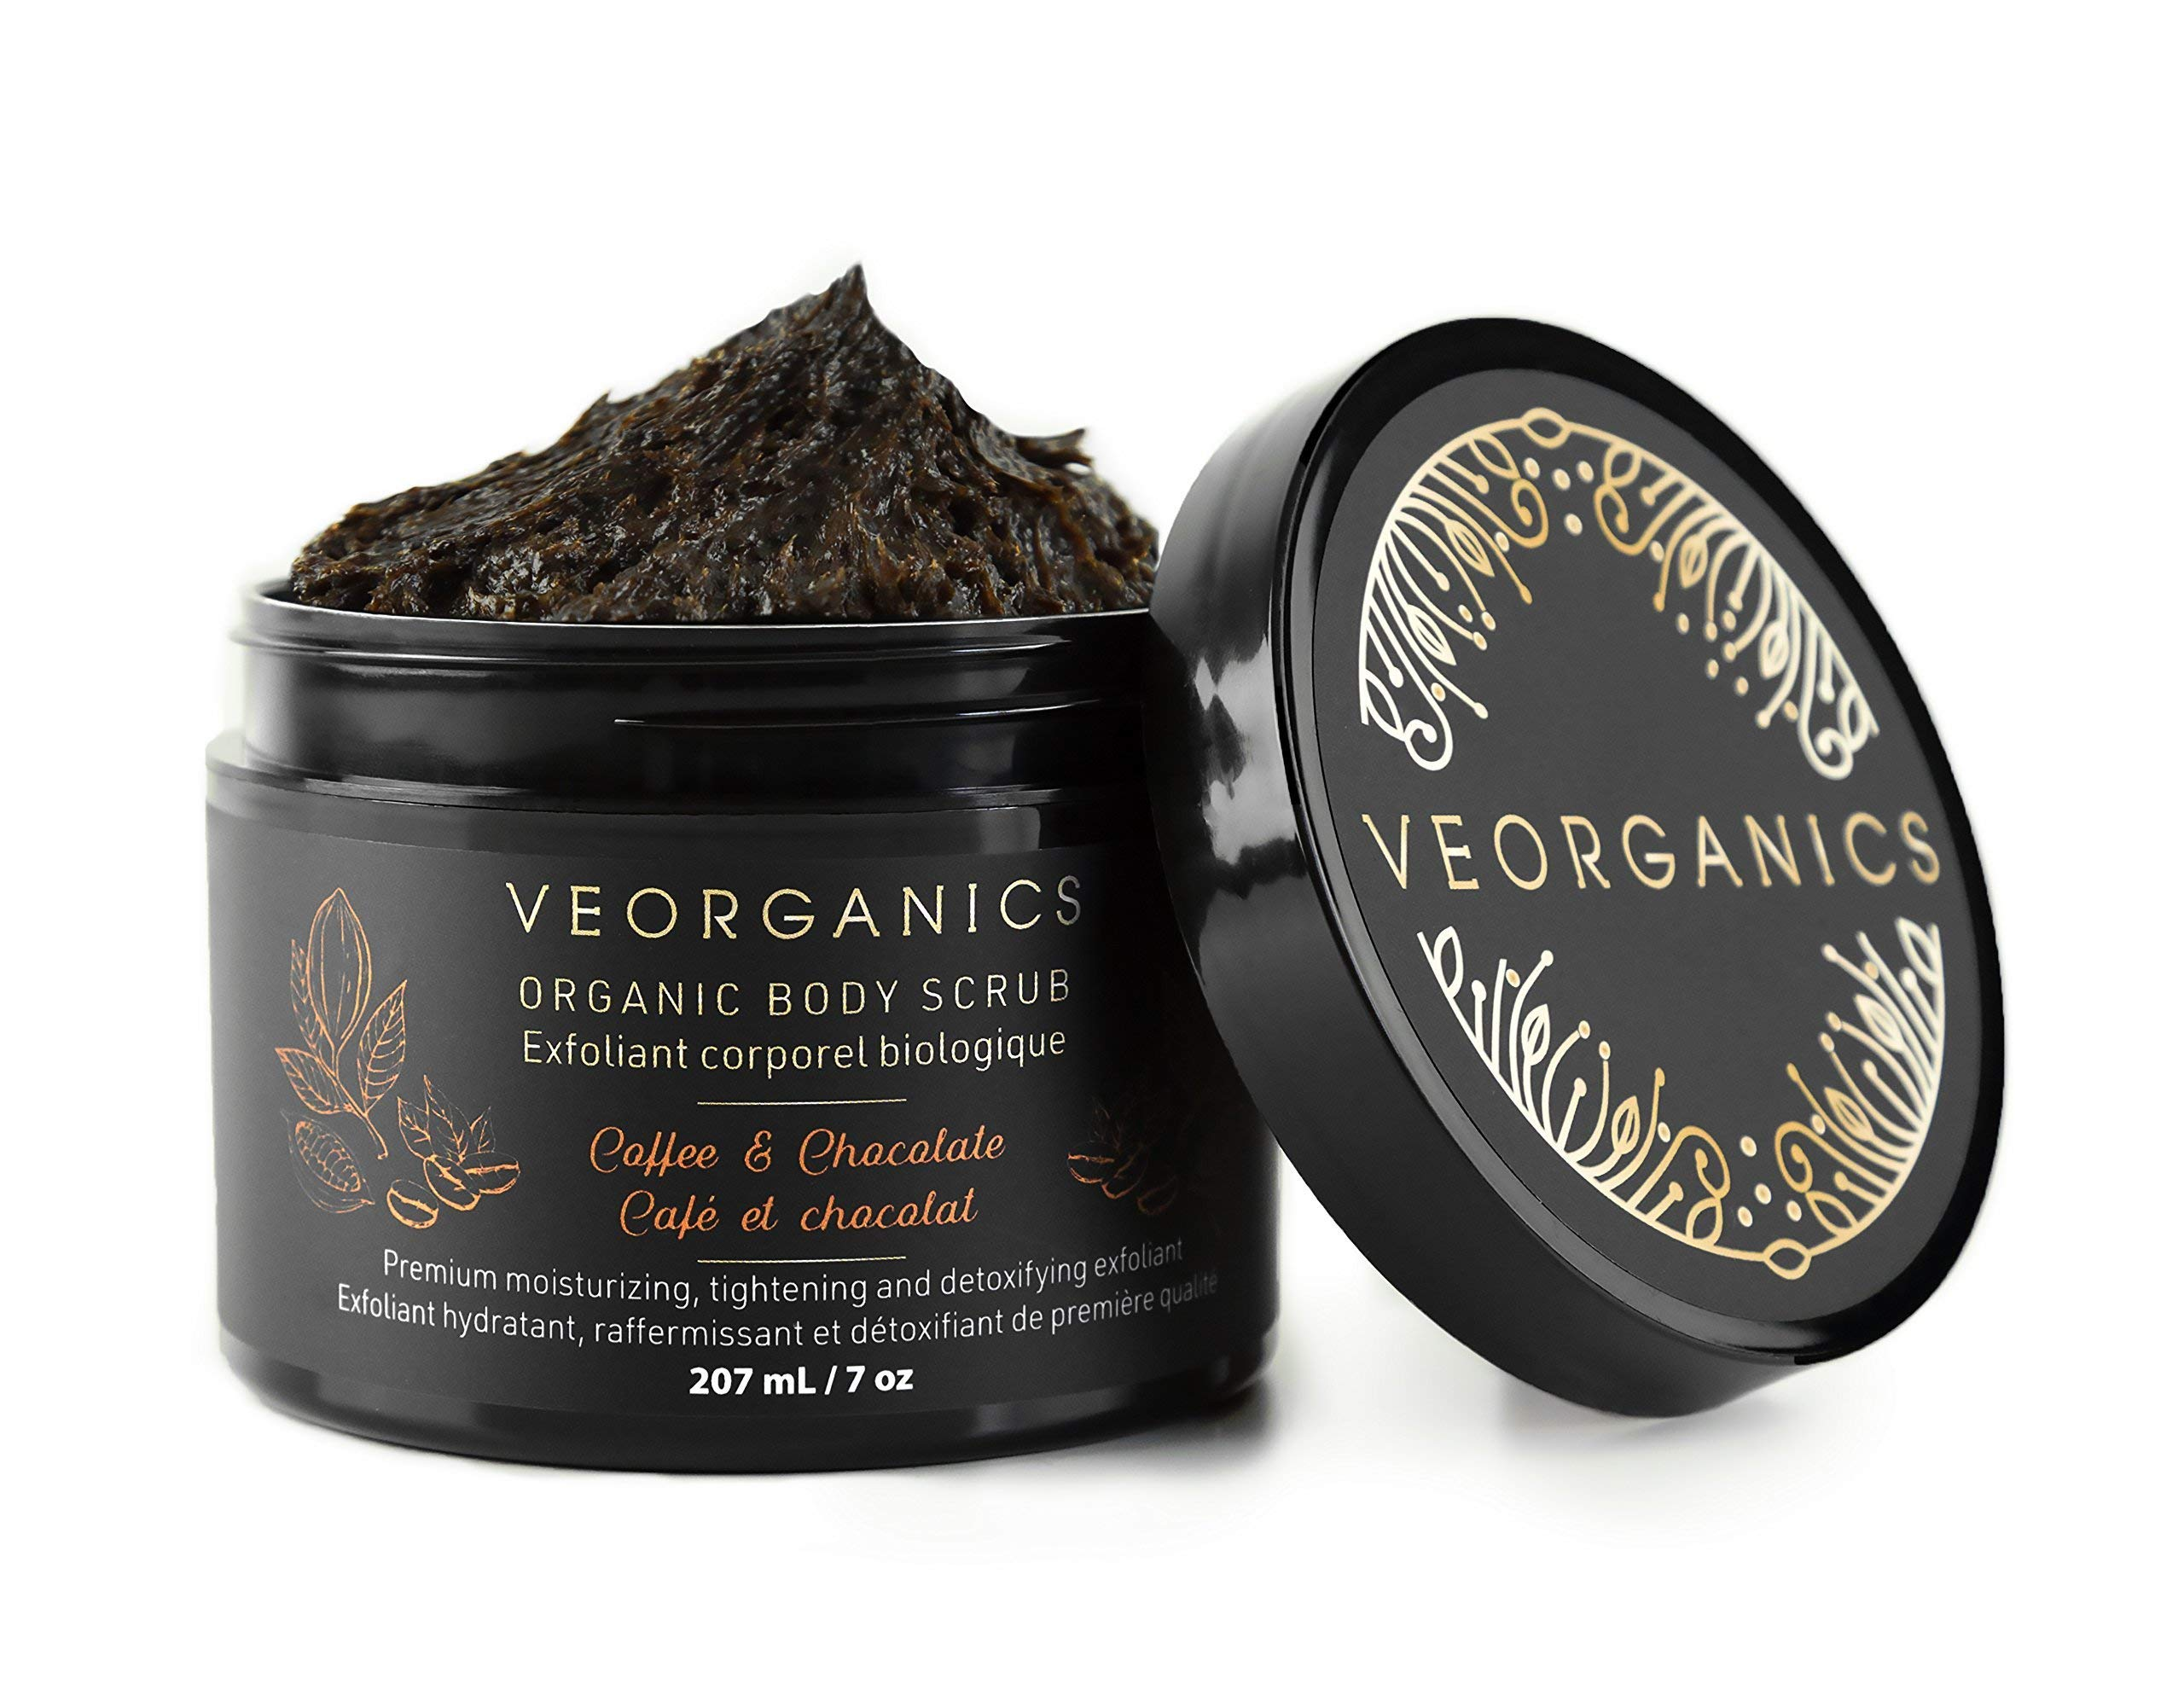 CDM product Organic Coffee & Chocolate Body Scrub by VeOrganics - Premium Moisturizing, Tightening and Detoxifying Exfoliant big image